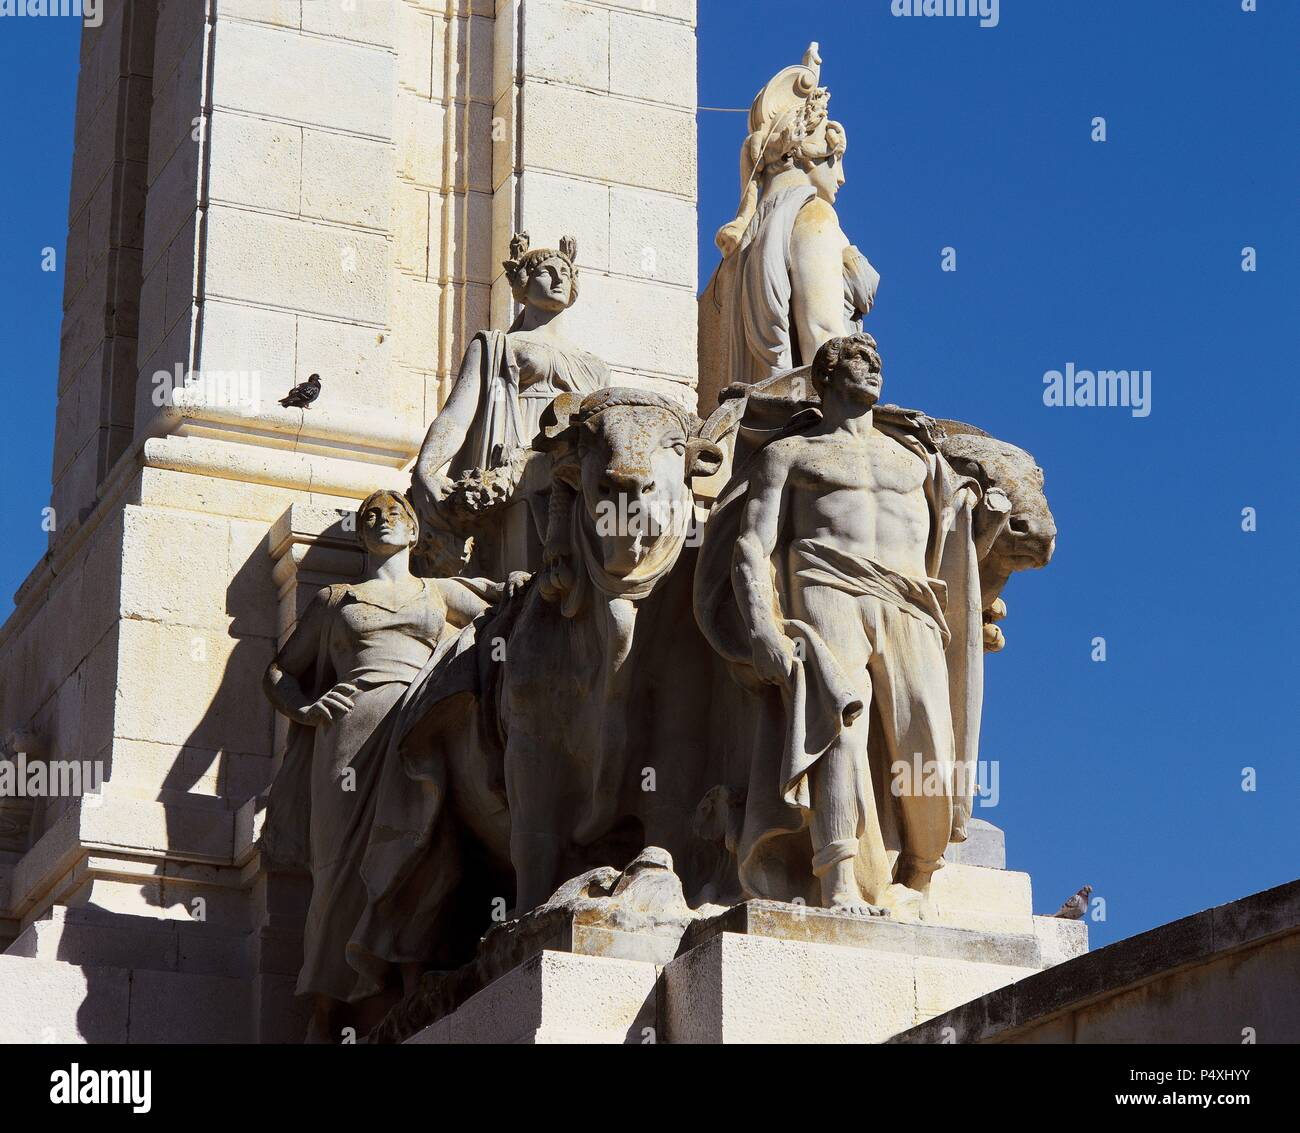 MONUMENTO A LAS CORTES LIBERALES, obra de Aniceto MARINAS. Detalle ...